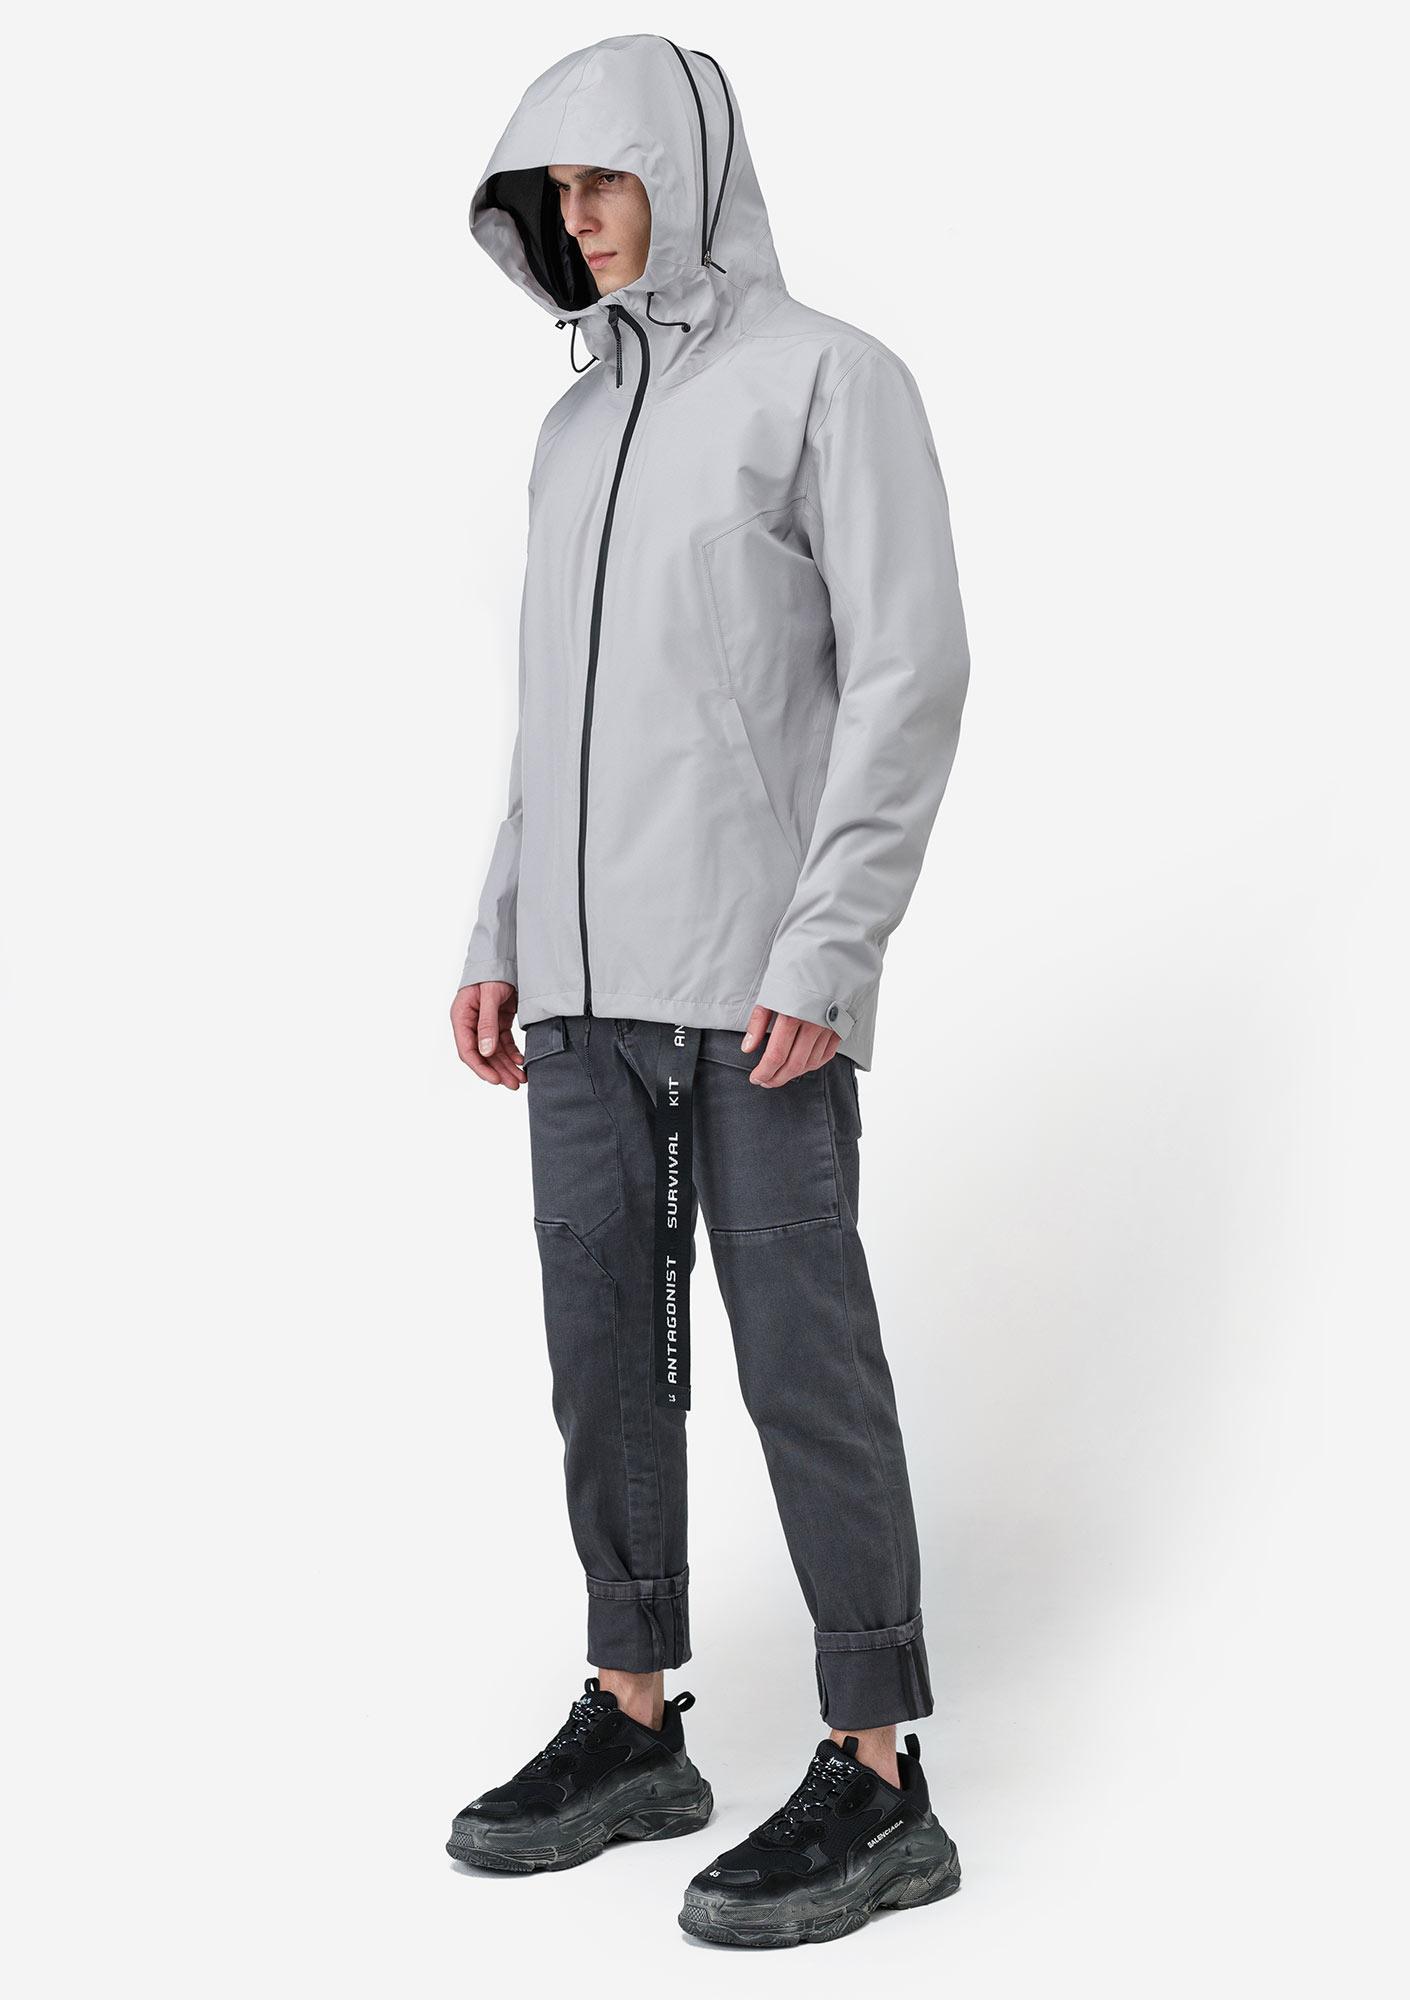 Технологичная куртка KRAKATAU Q159/3 FOMALHAUT